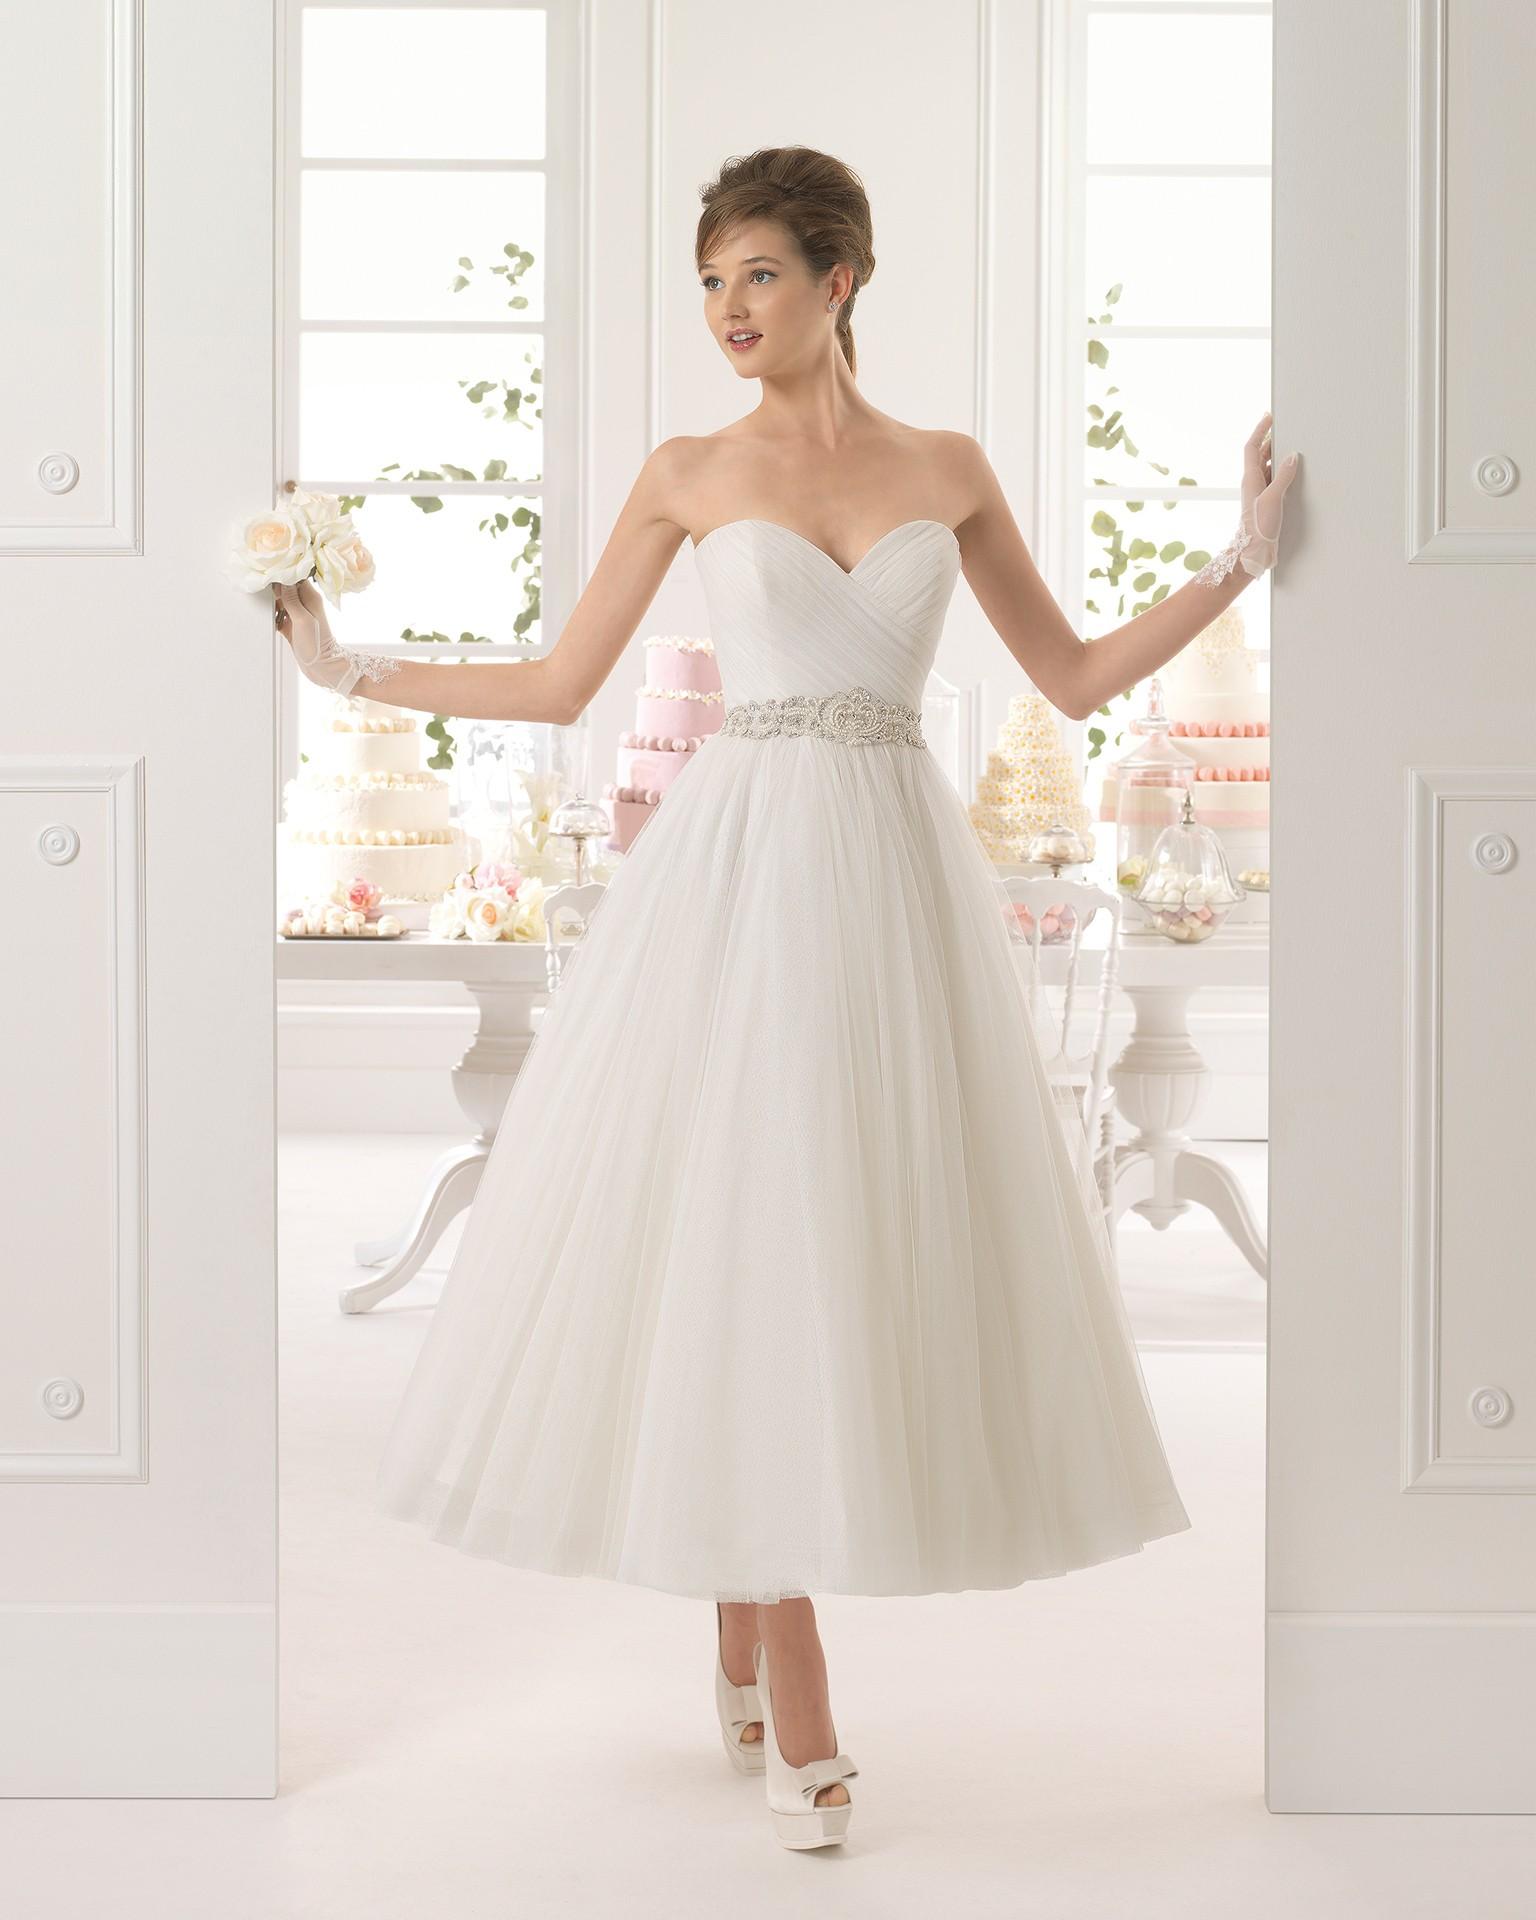 Vestido de novia con falda midi de la firma Aire Barcelona